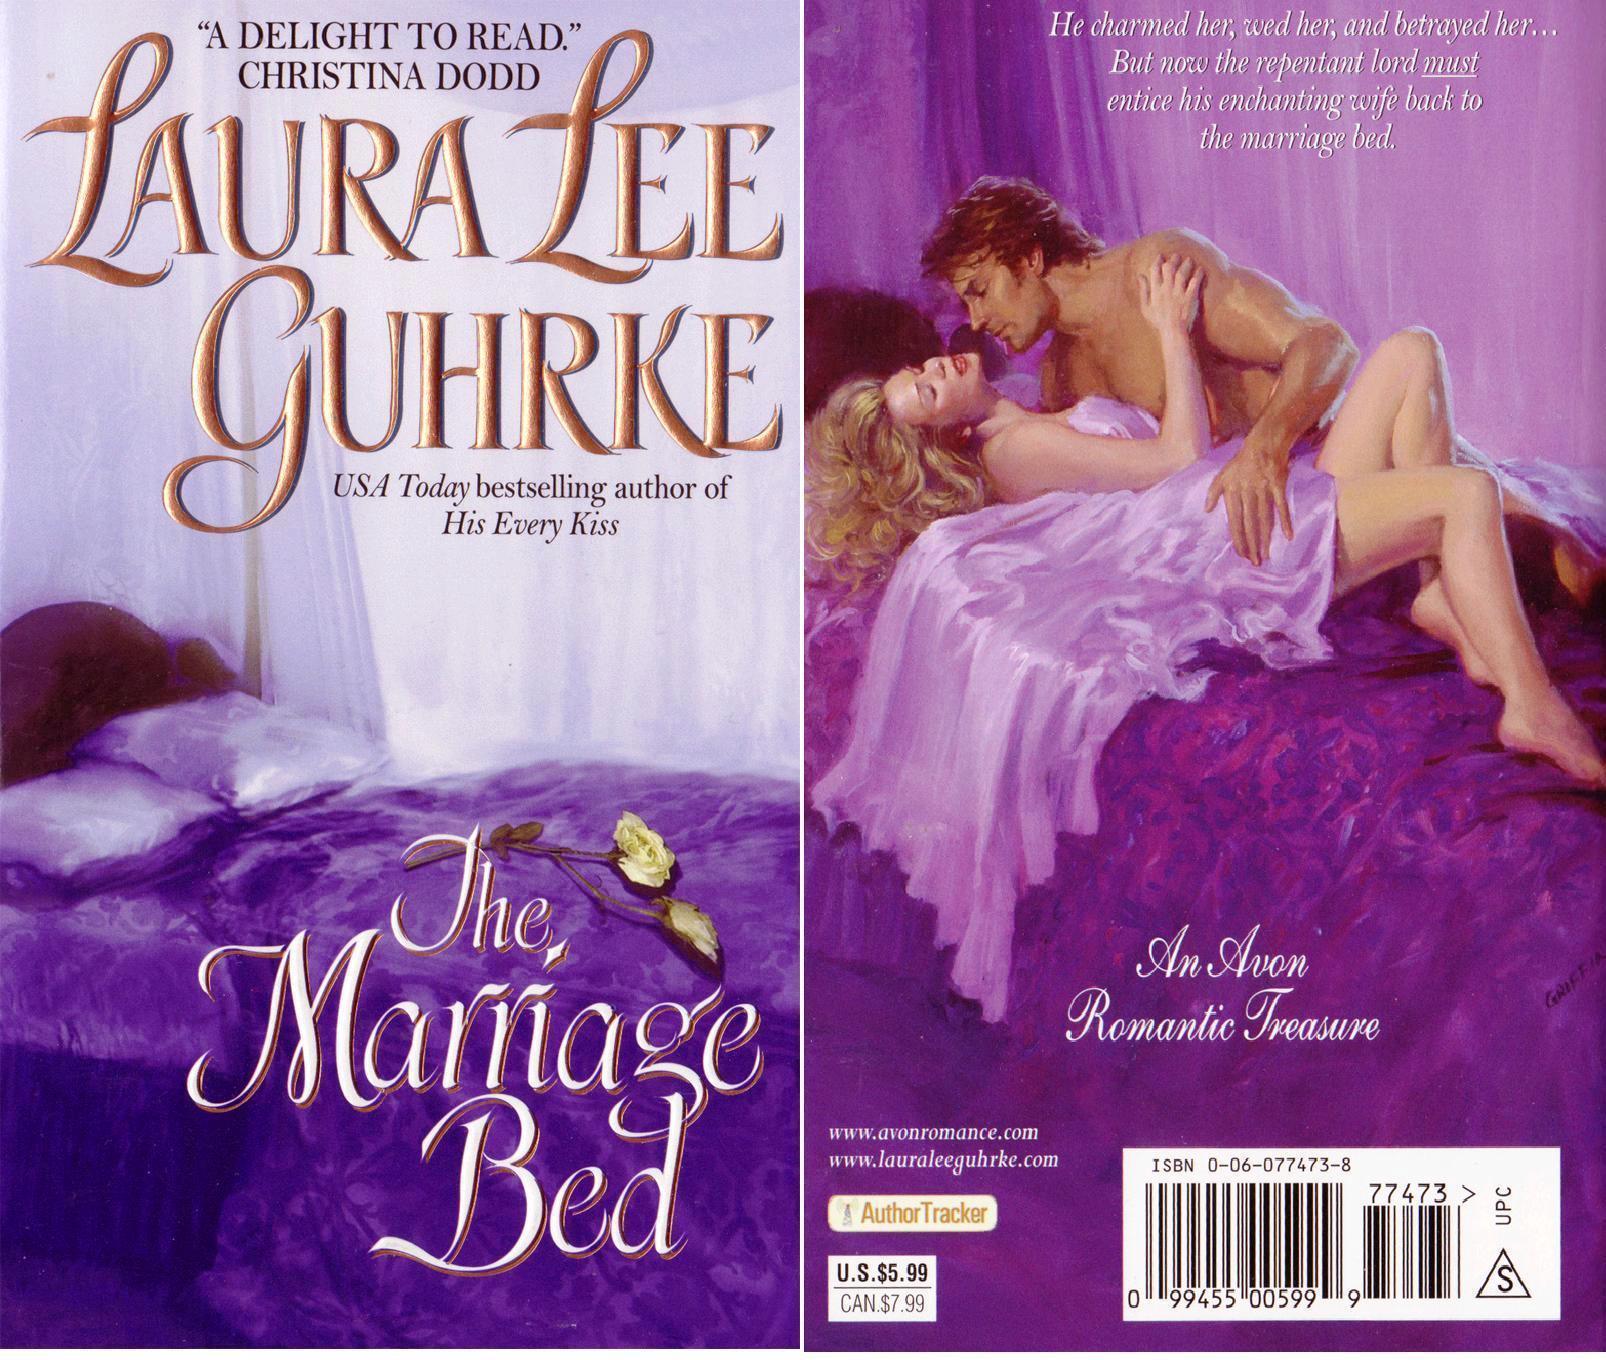 Romance Book Cover Questions : Laura lee guhrke historical romance photo fanpop